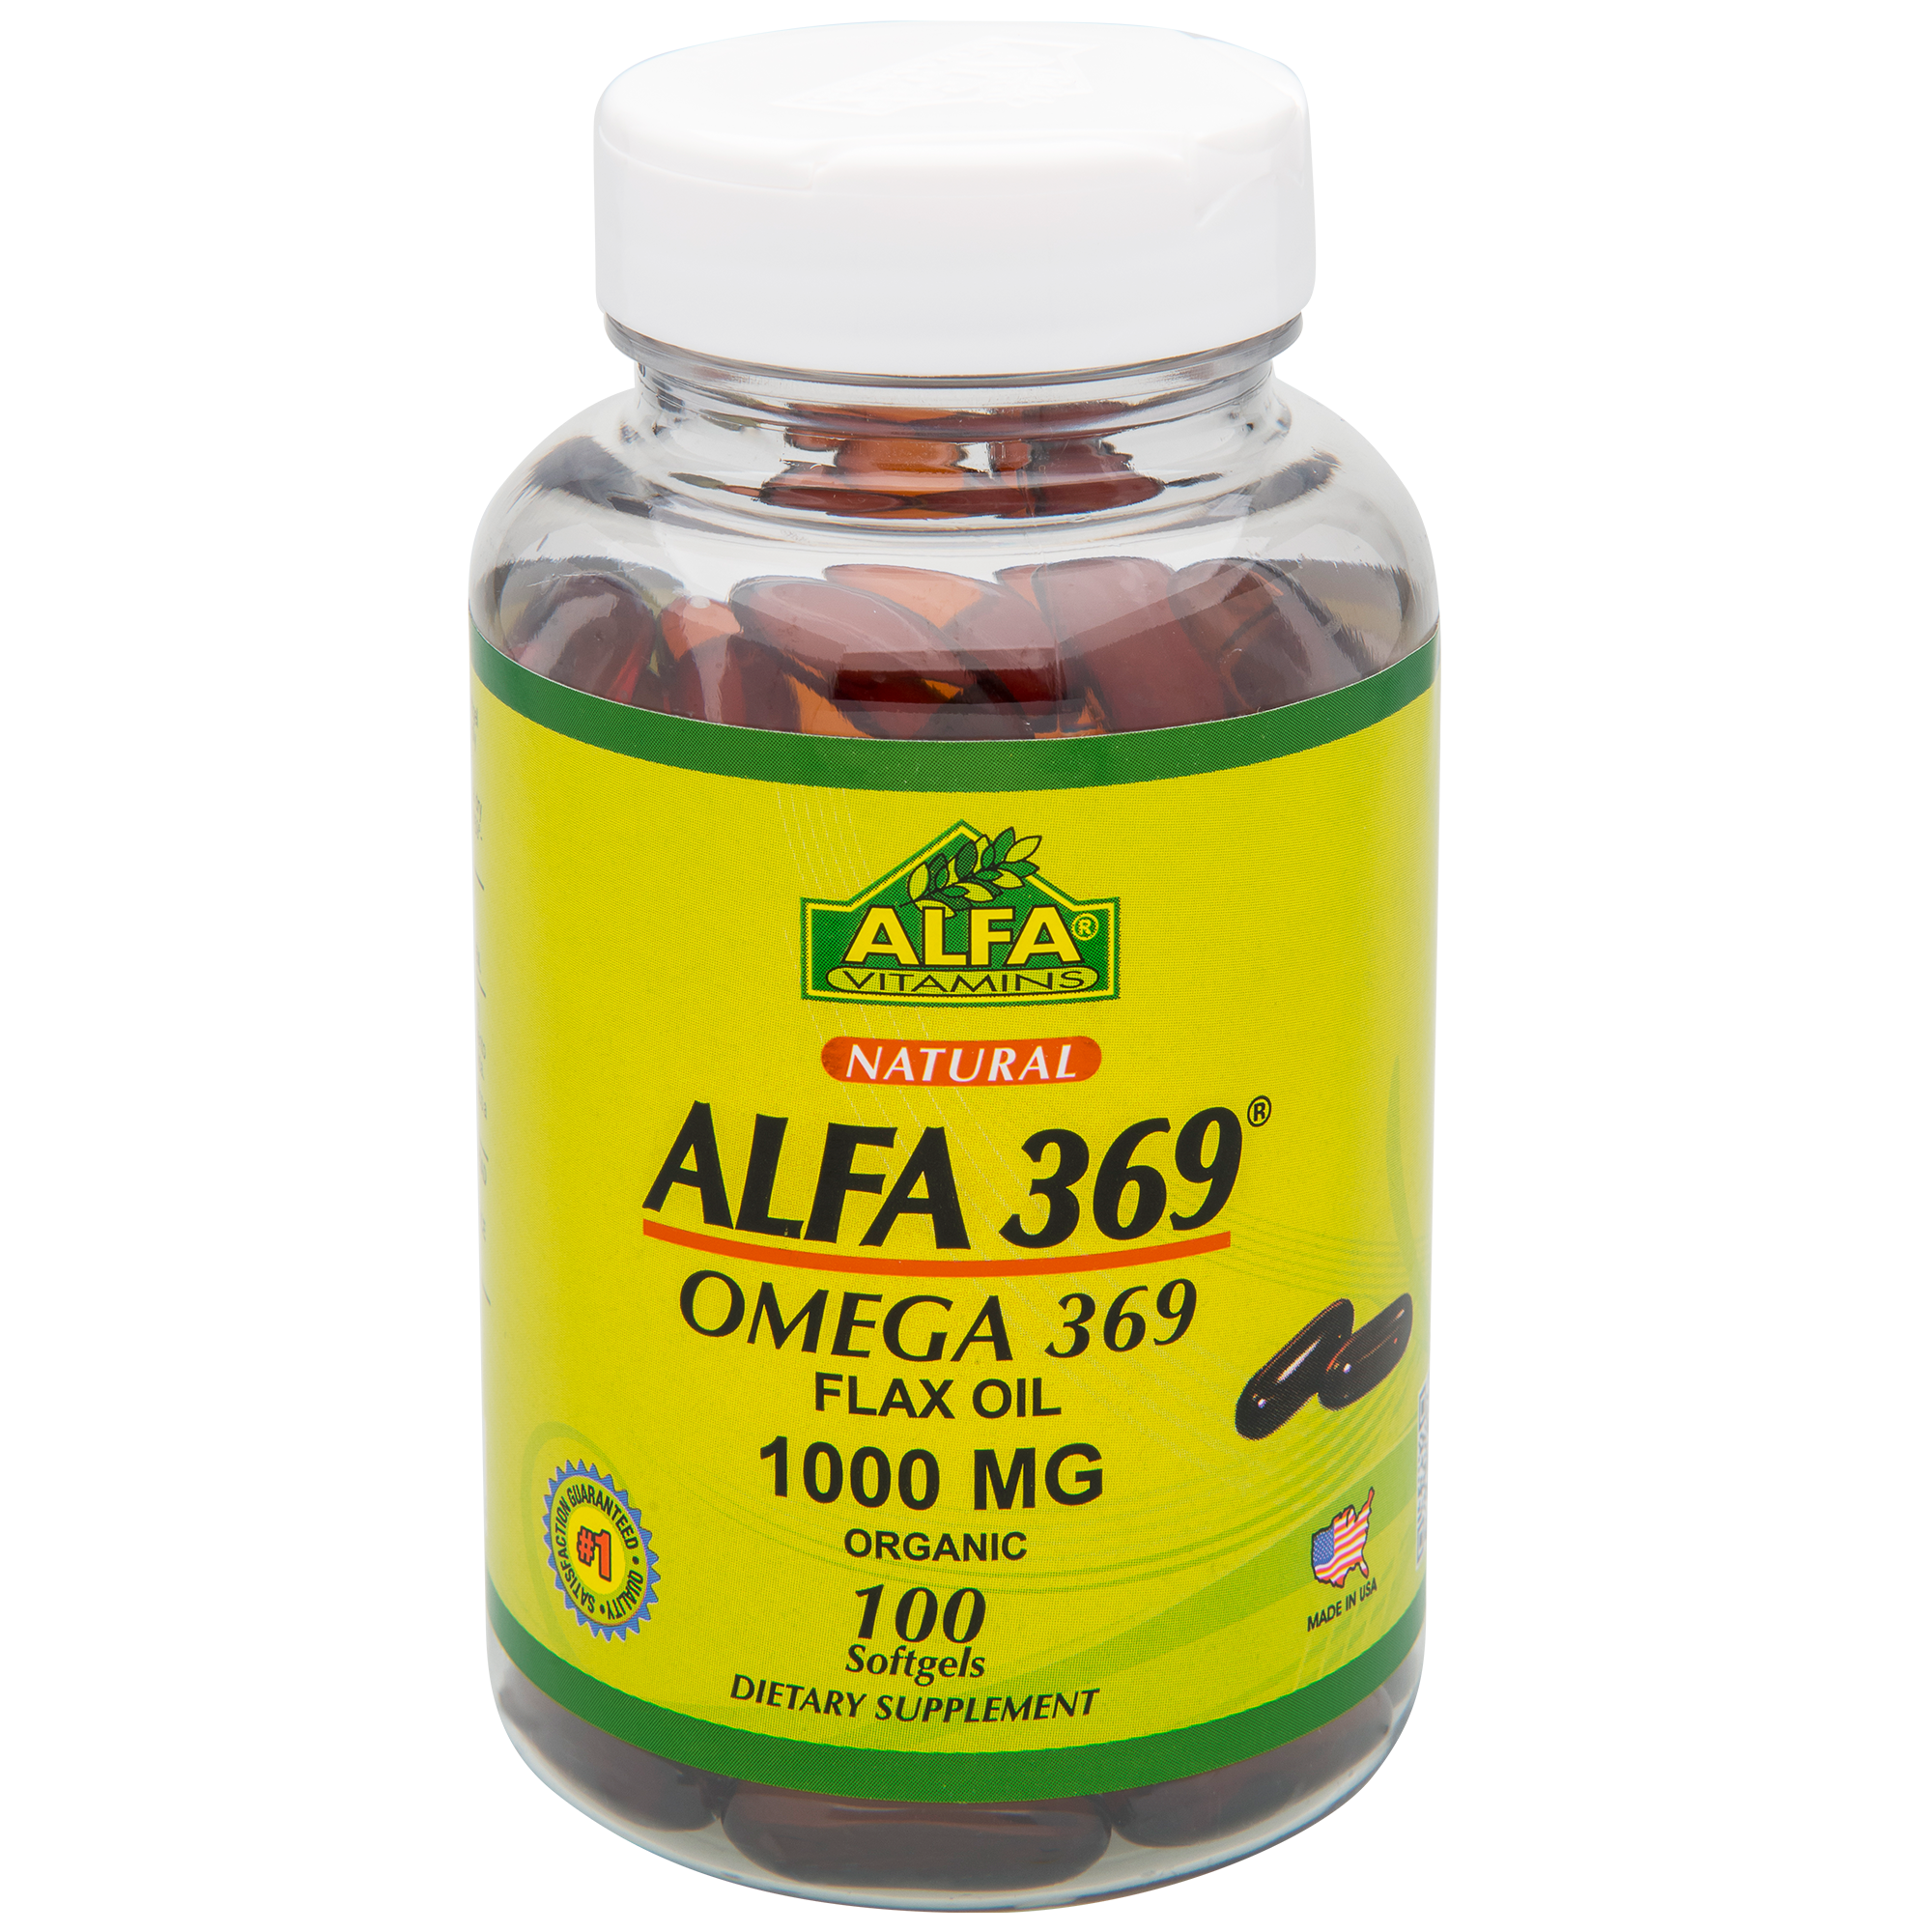 Bulk flax seed for crafts - Alfa Omega 369 Flax Oil 1000 Softgels 100 Ct